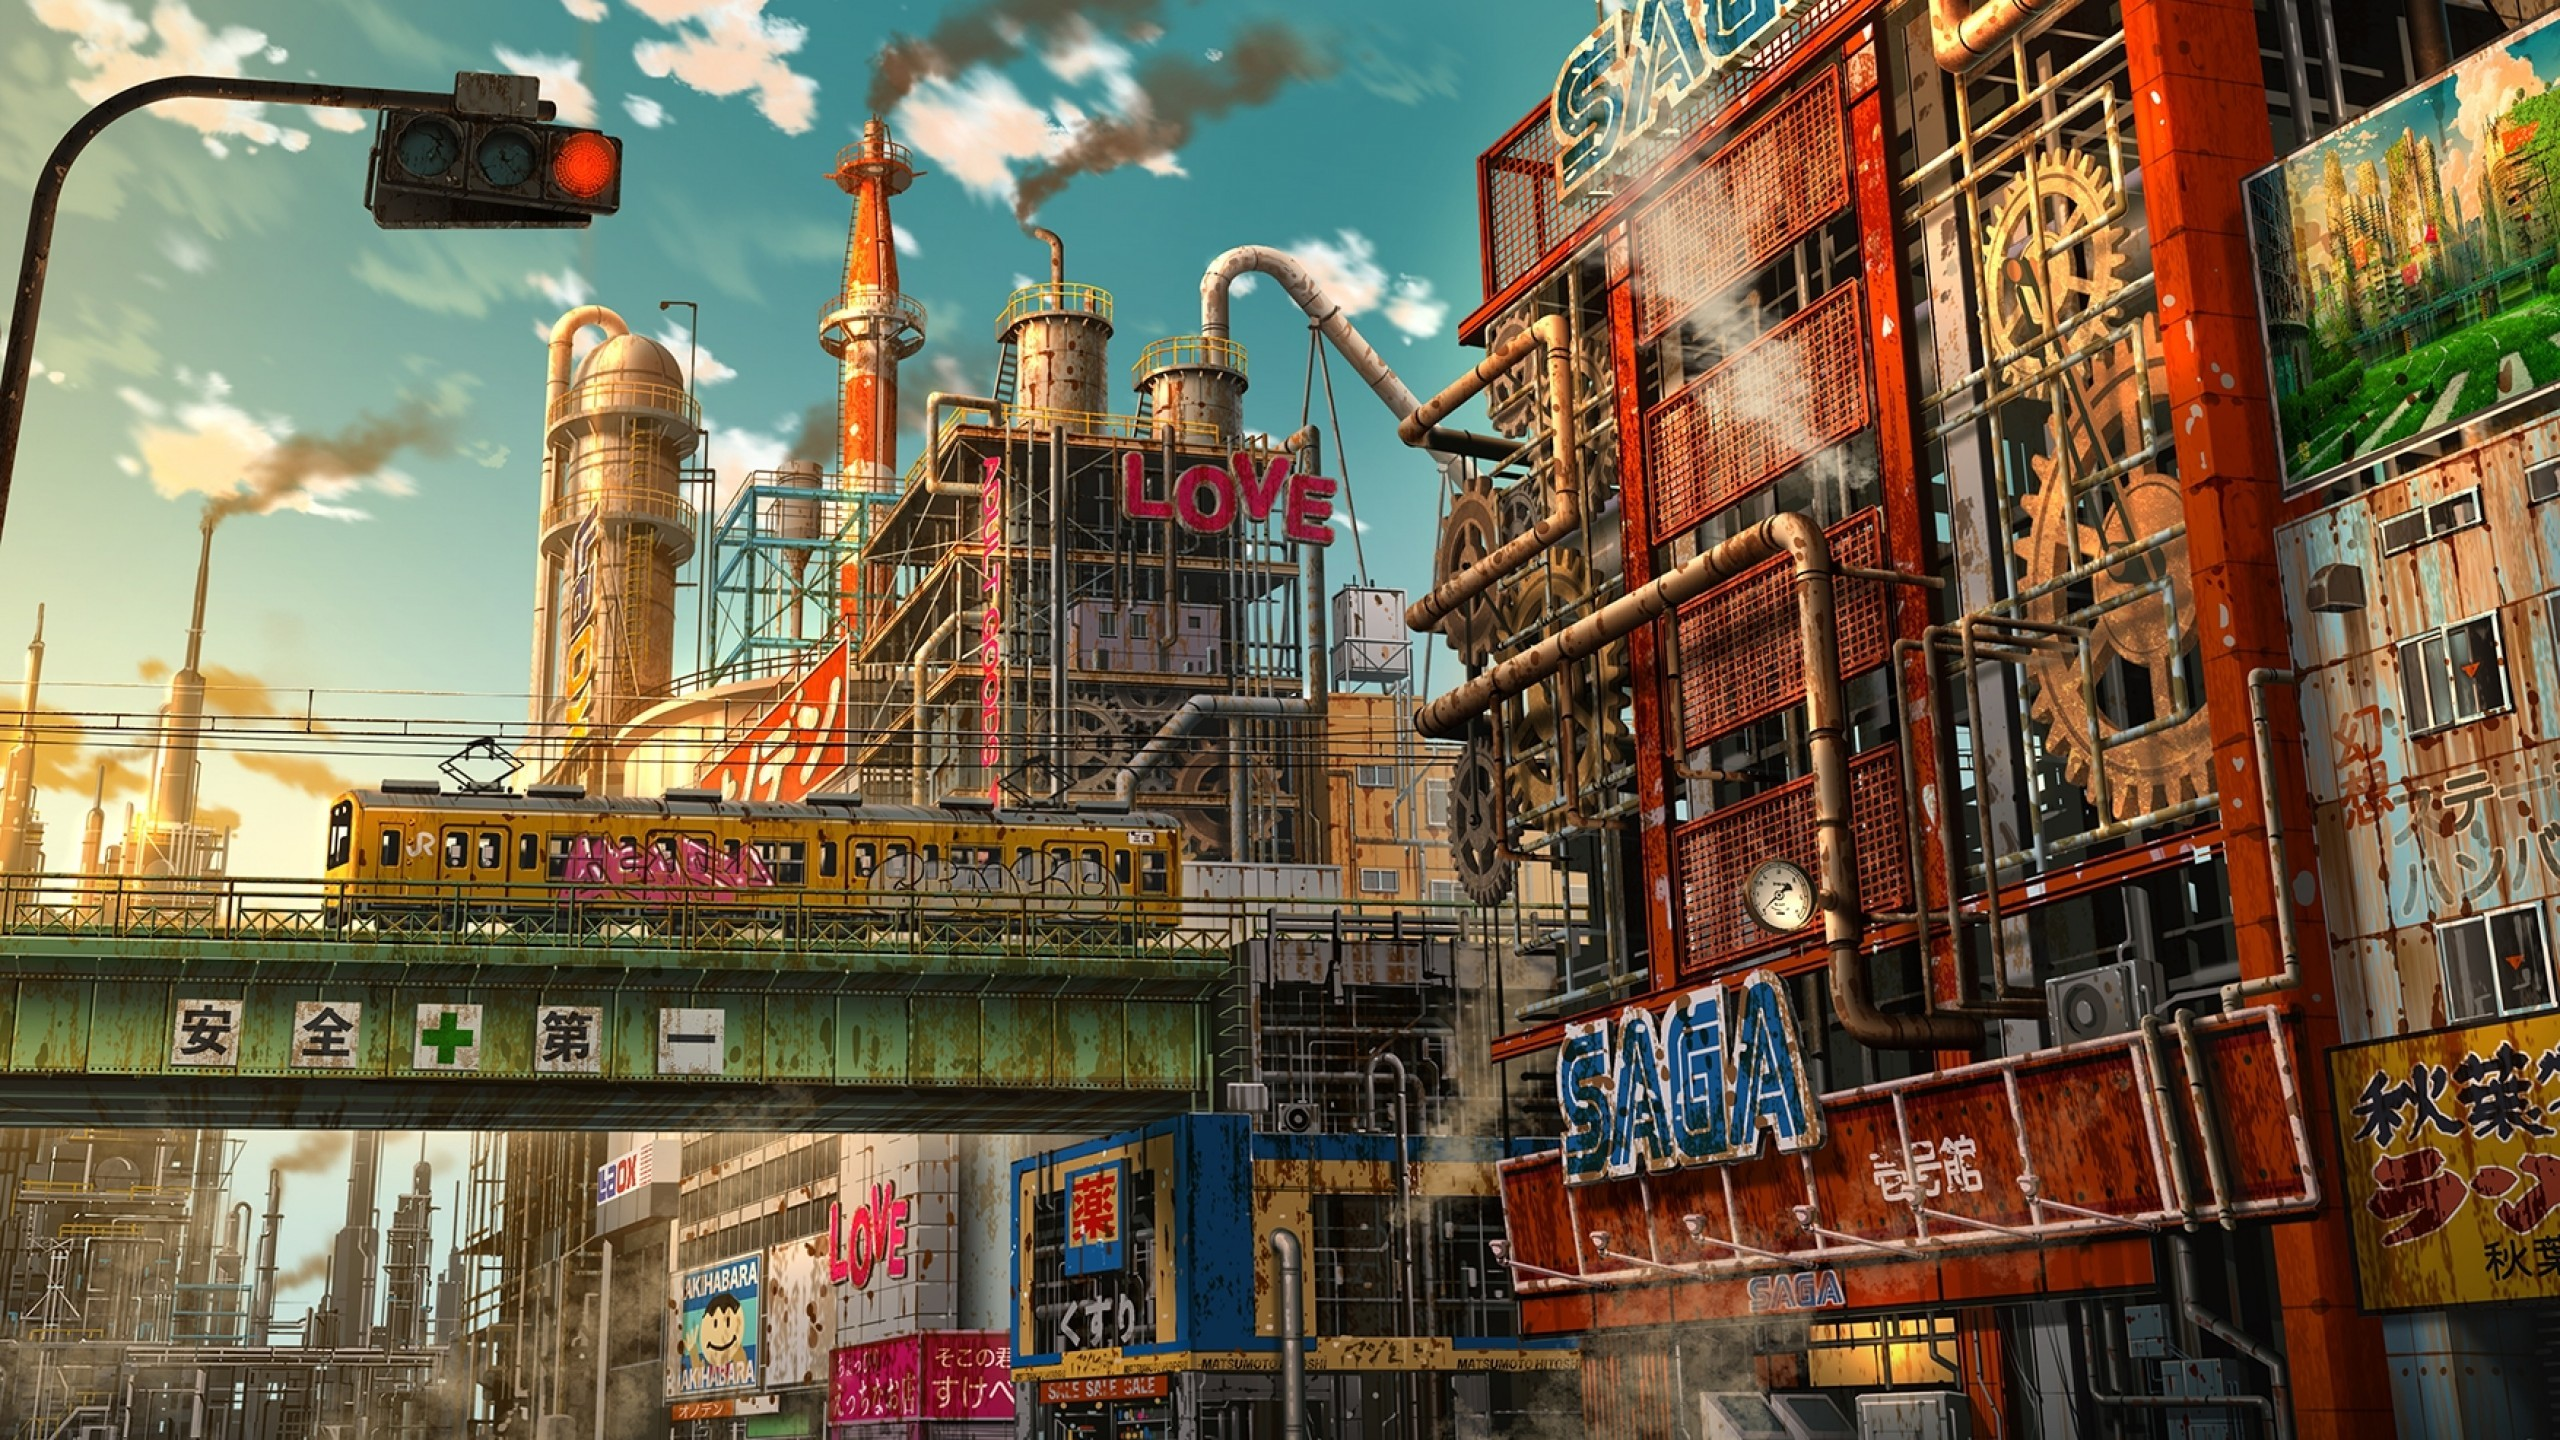 Futuristic Anime City Apocalypse Ruins Tokyo Japan 2560x1440 Download Hd Wallpaper Wallpapertip